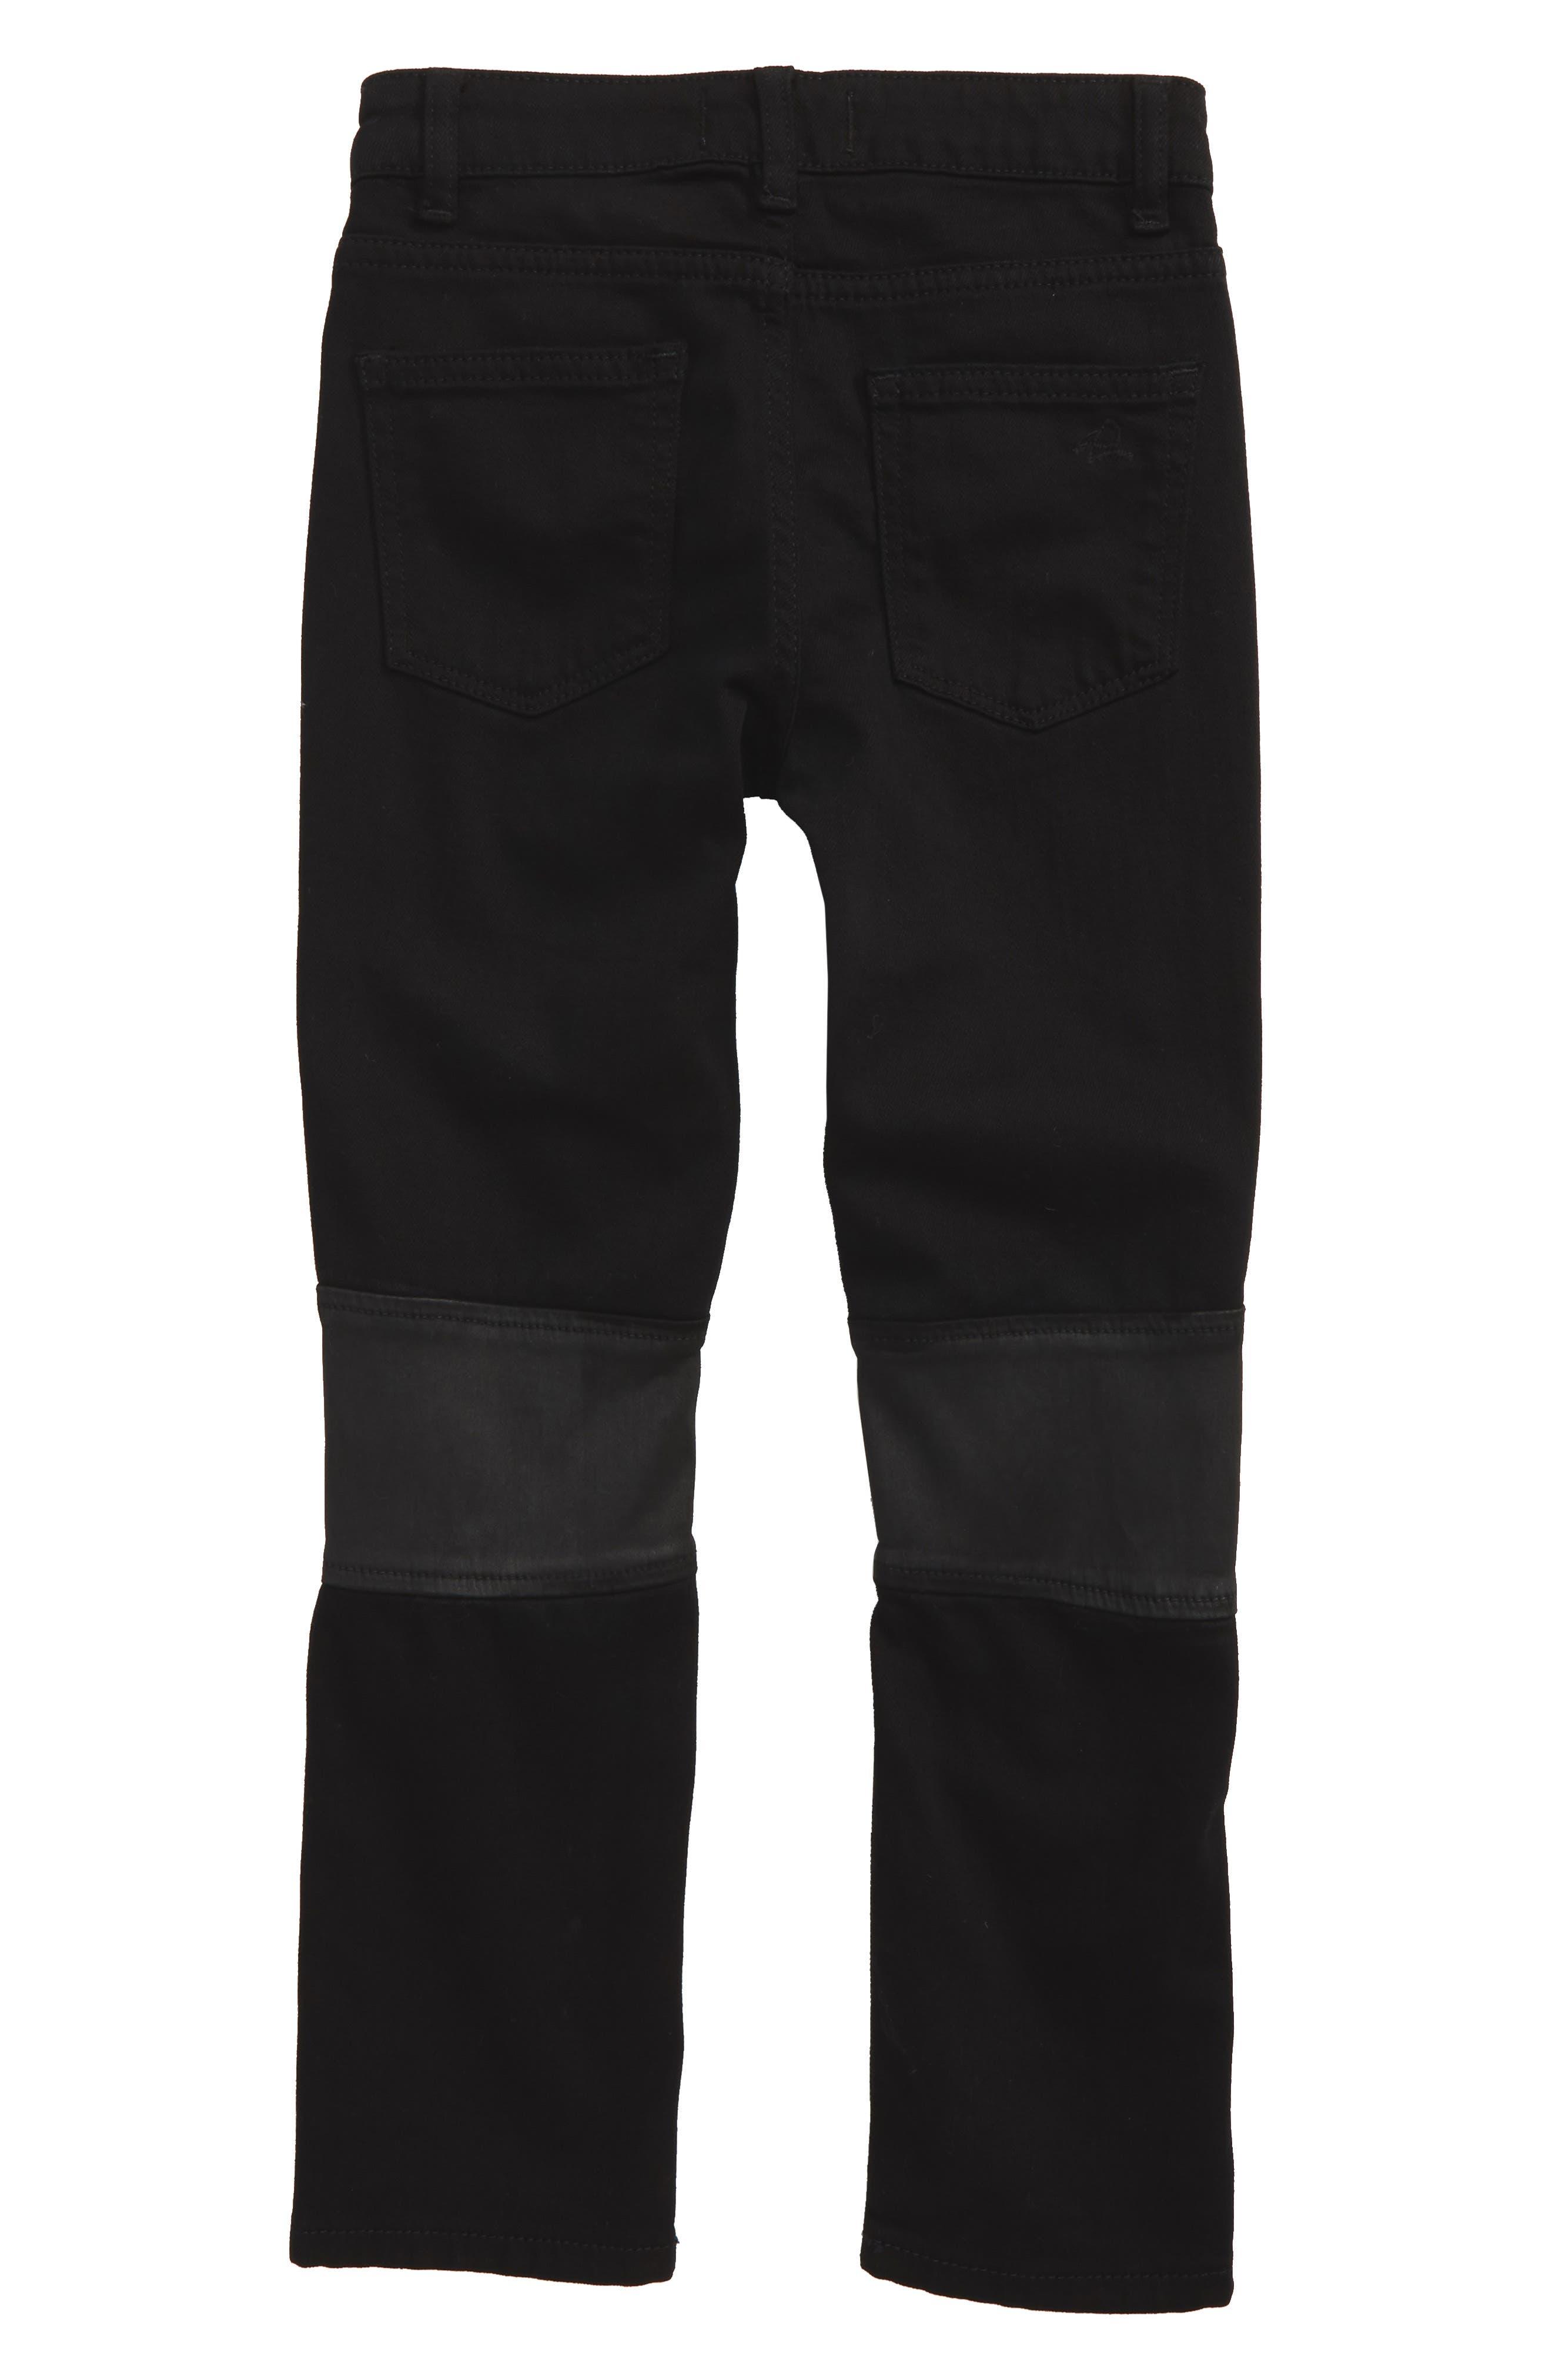 Hawke Skinny Moto Jeans,                             Alternate thumbnail 2, color,                             001